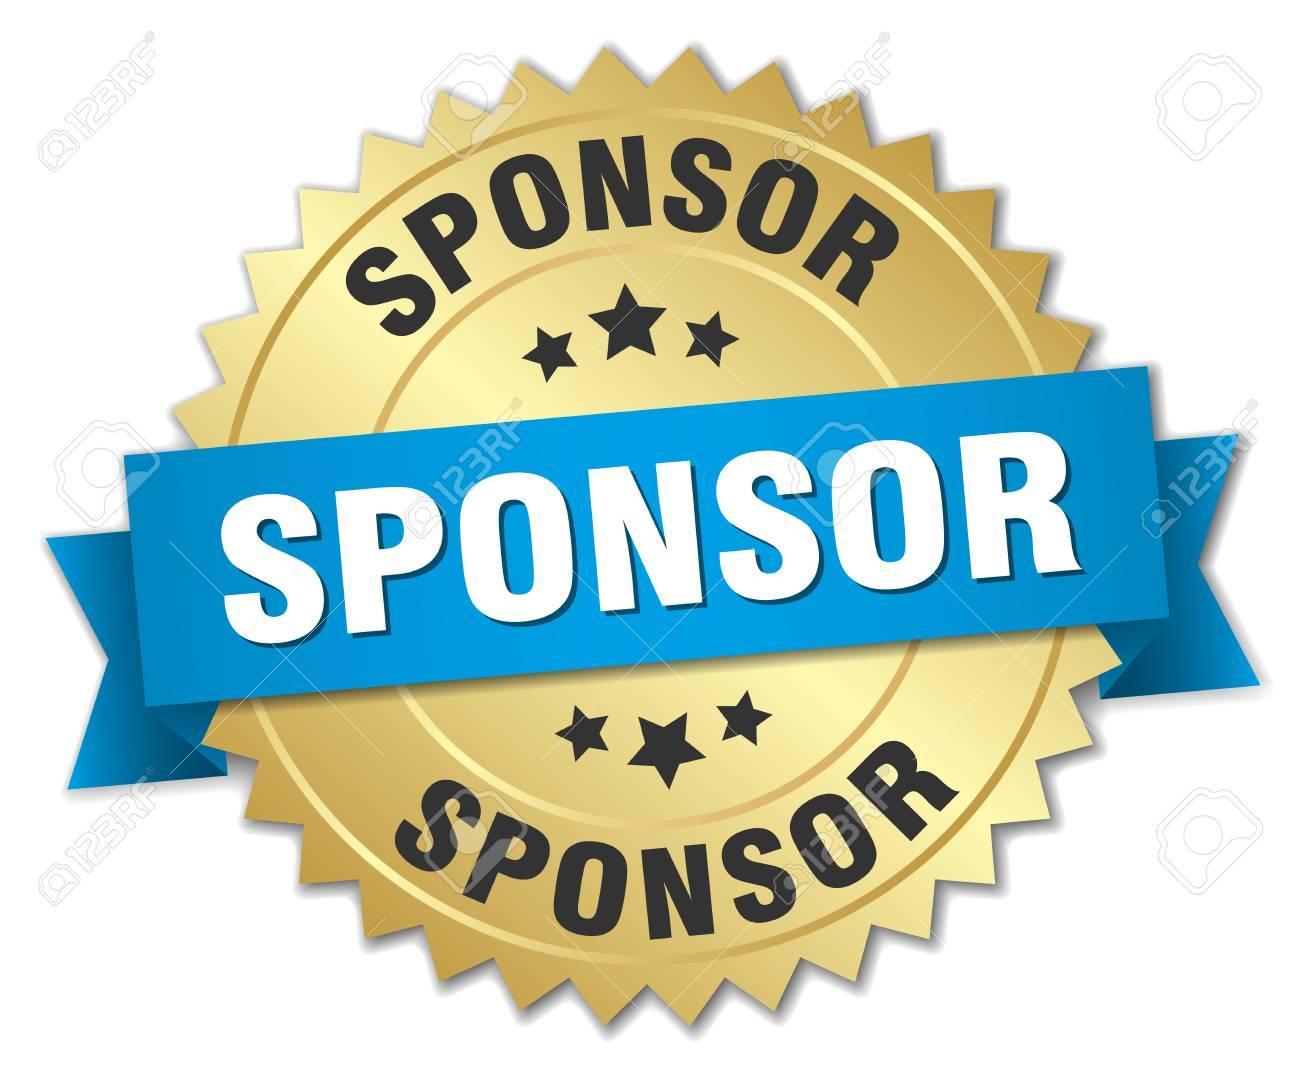 sponsor 3d gold badge with blue ribbon - 44345222